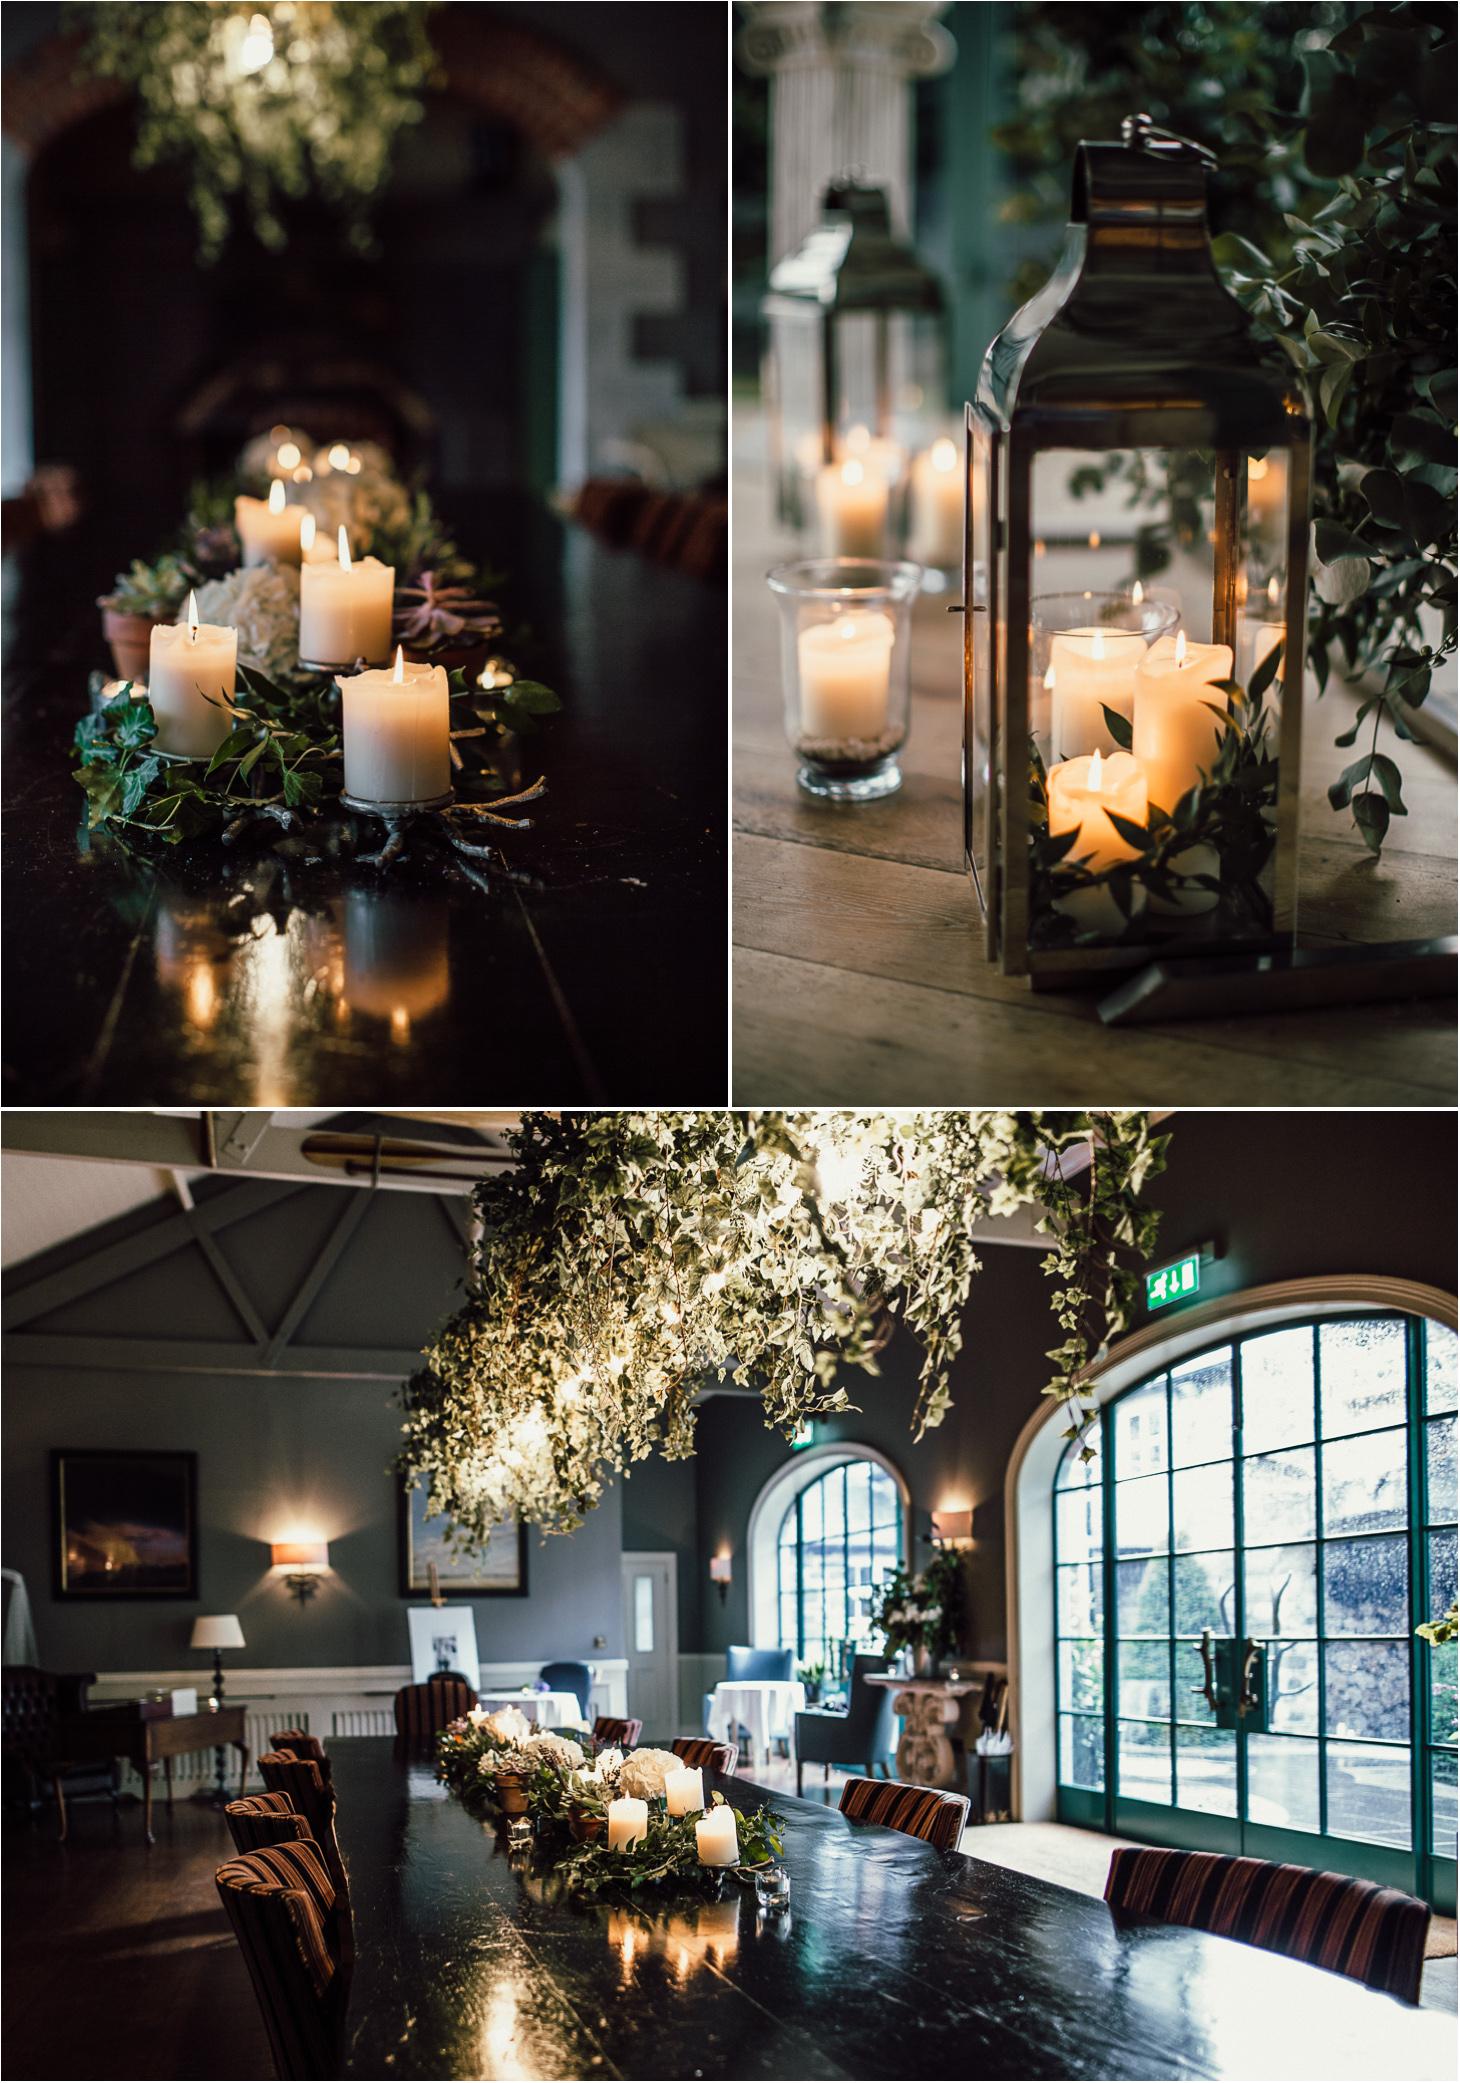 Virgina Lodge Photography. darren fitzpatrick. Wedding.28